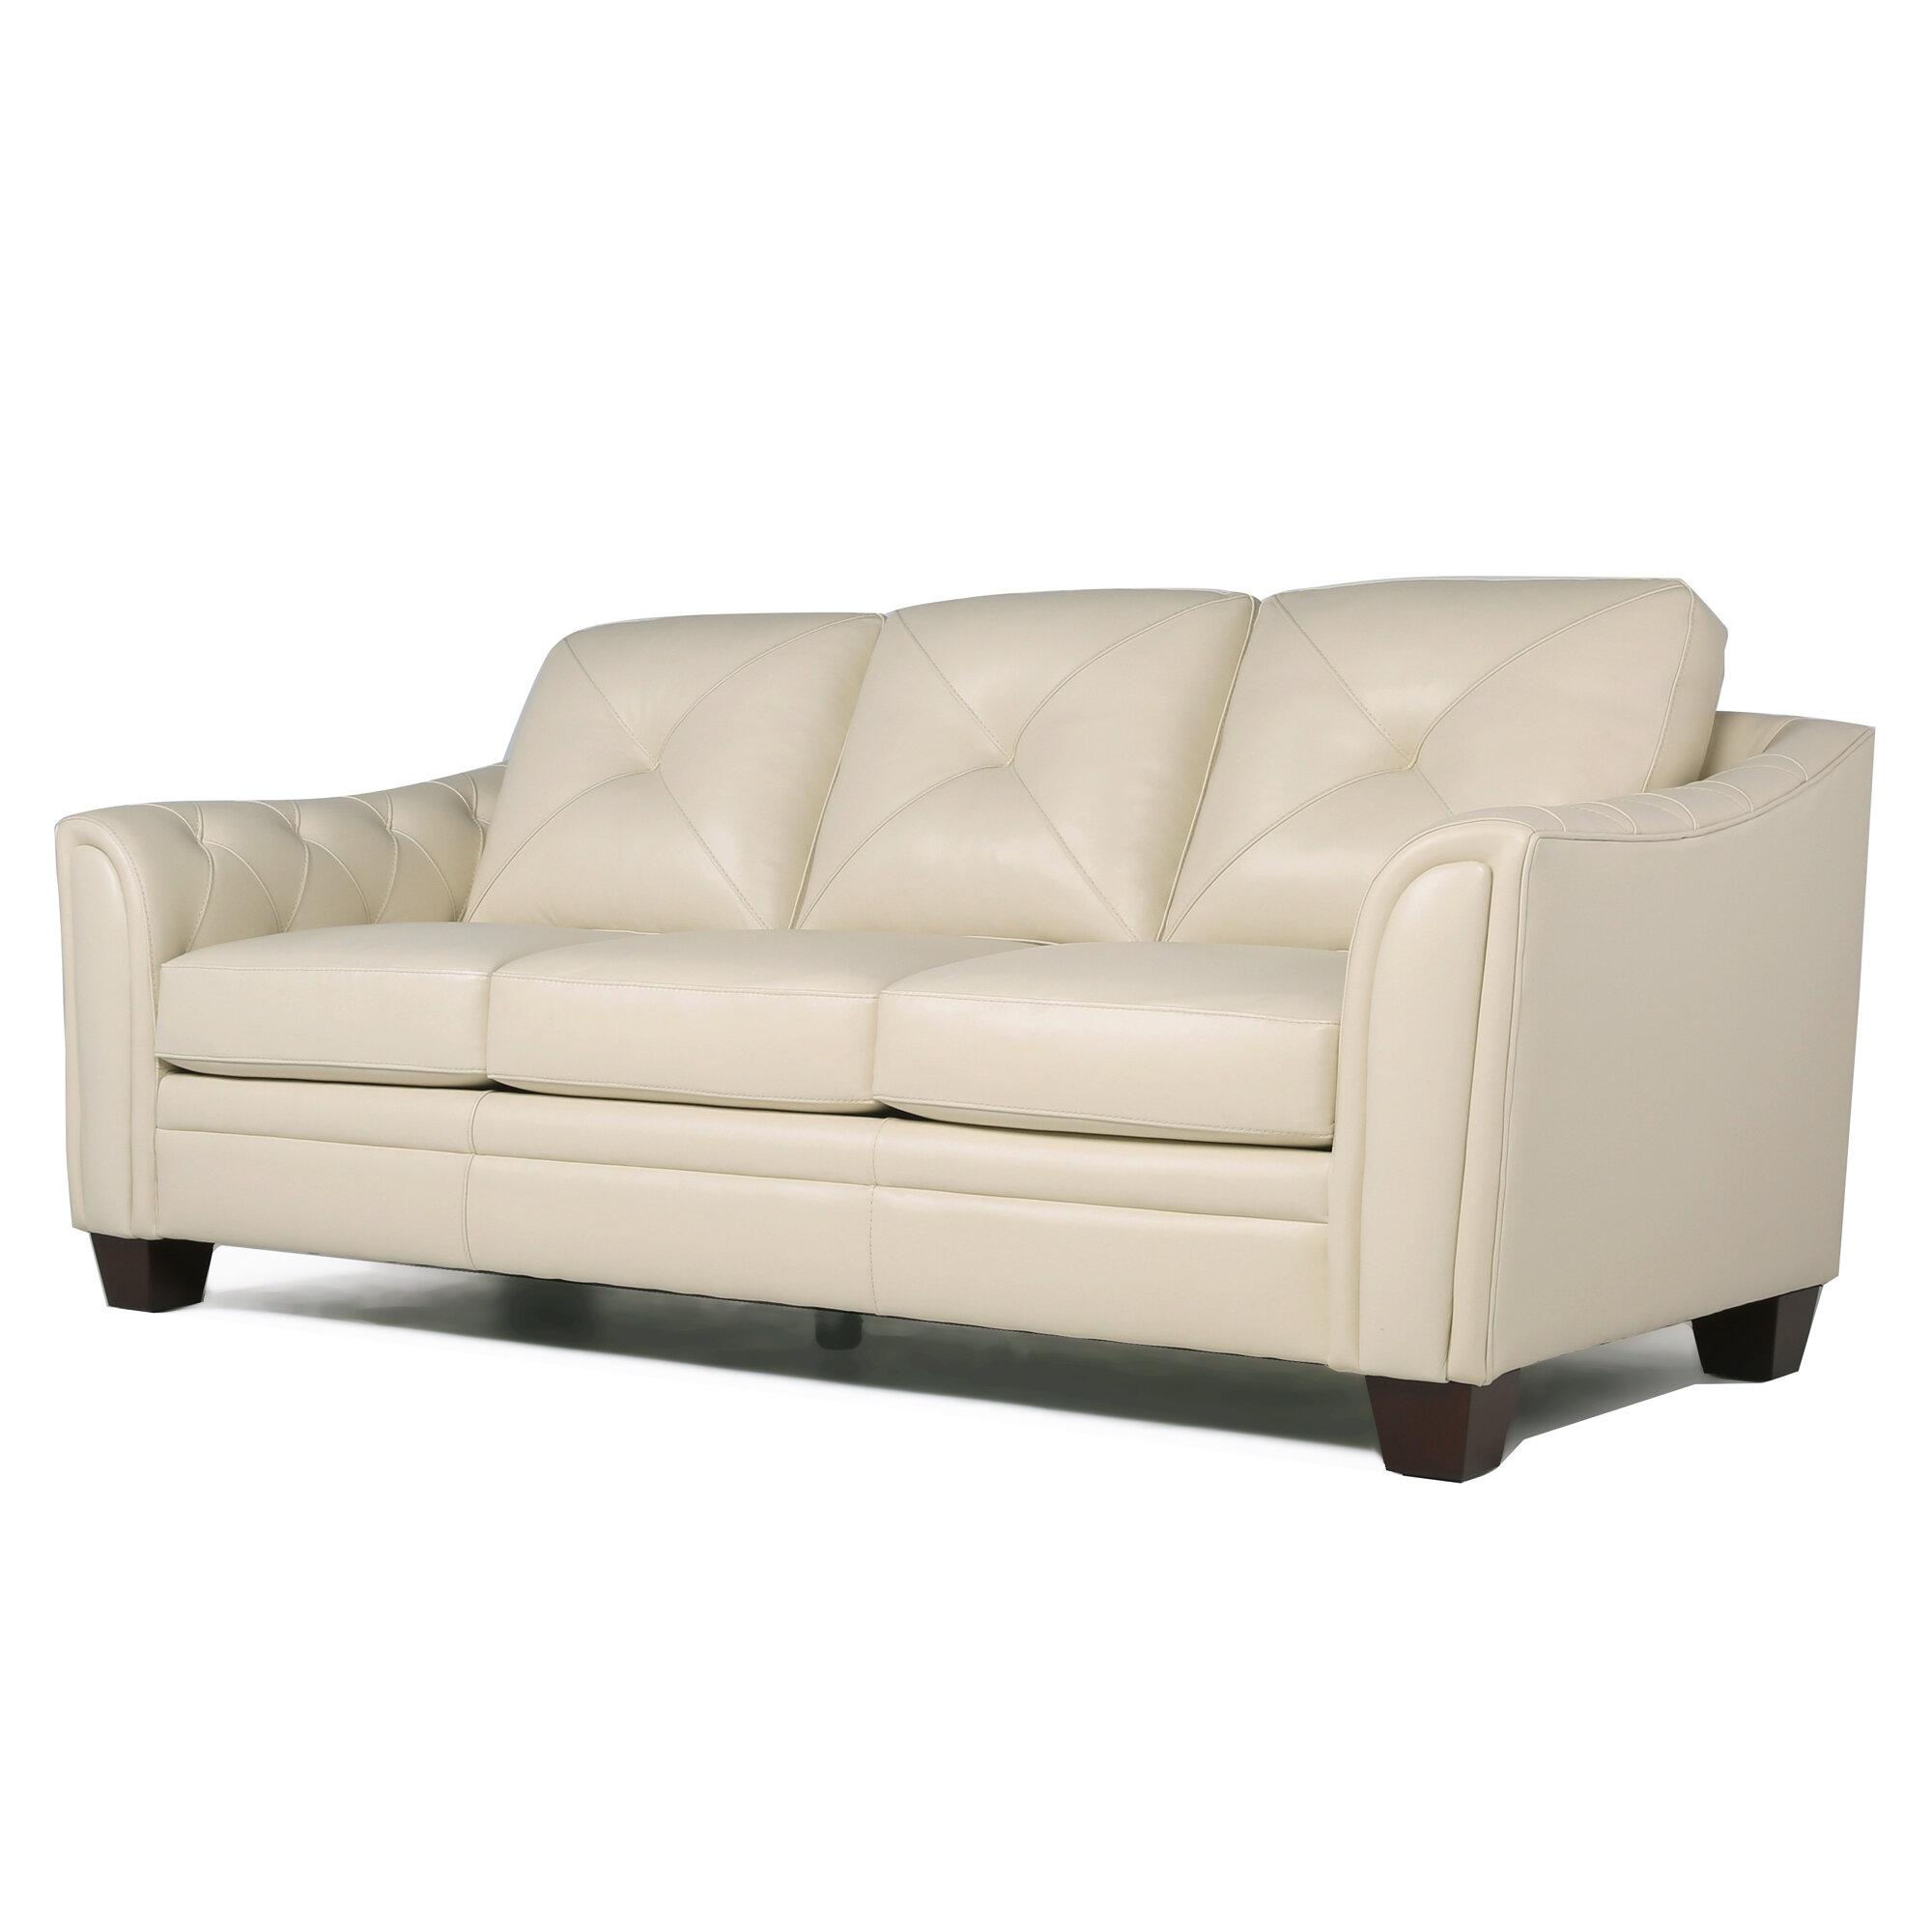 Cool Top Grain Leather Sofa Relax Marmaris Machost Co Dining Chair Design Ideas Machostcouk